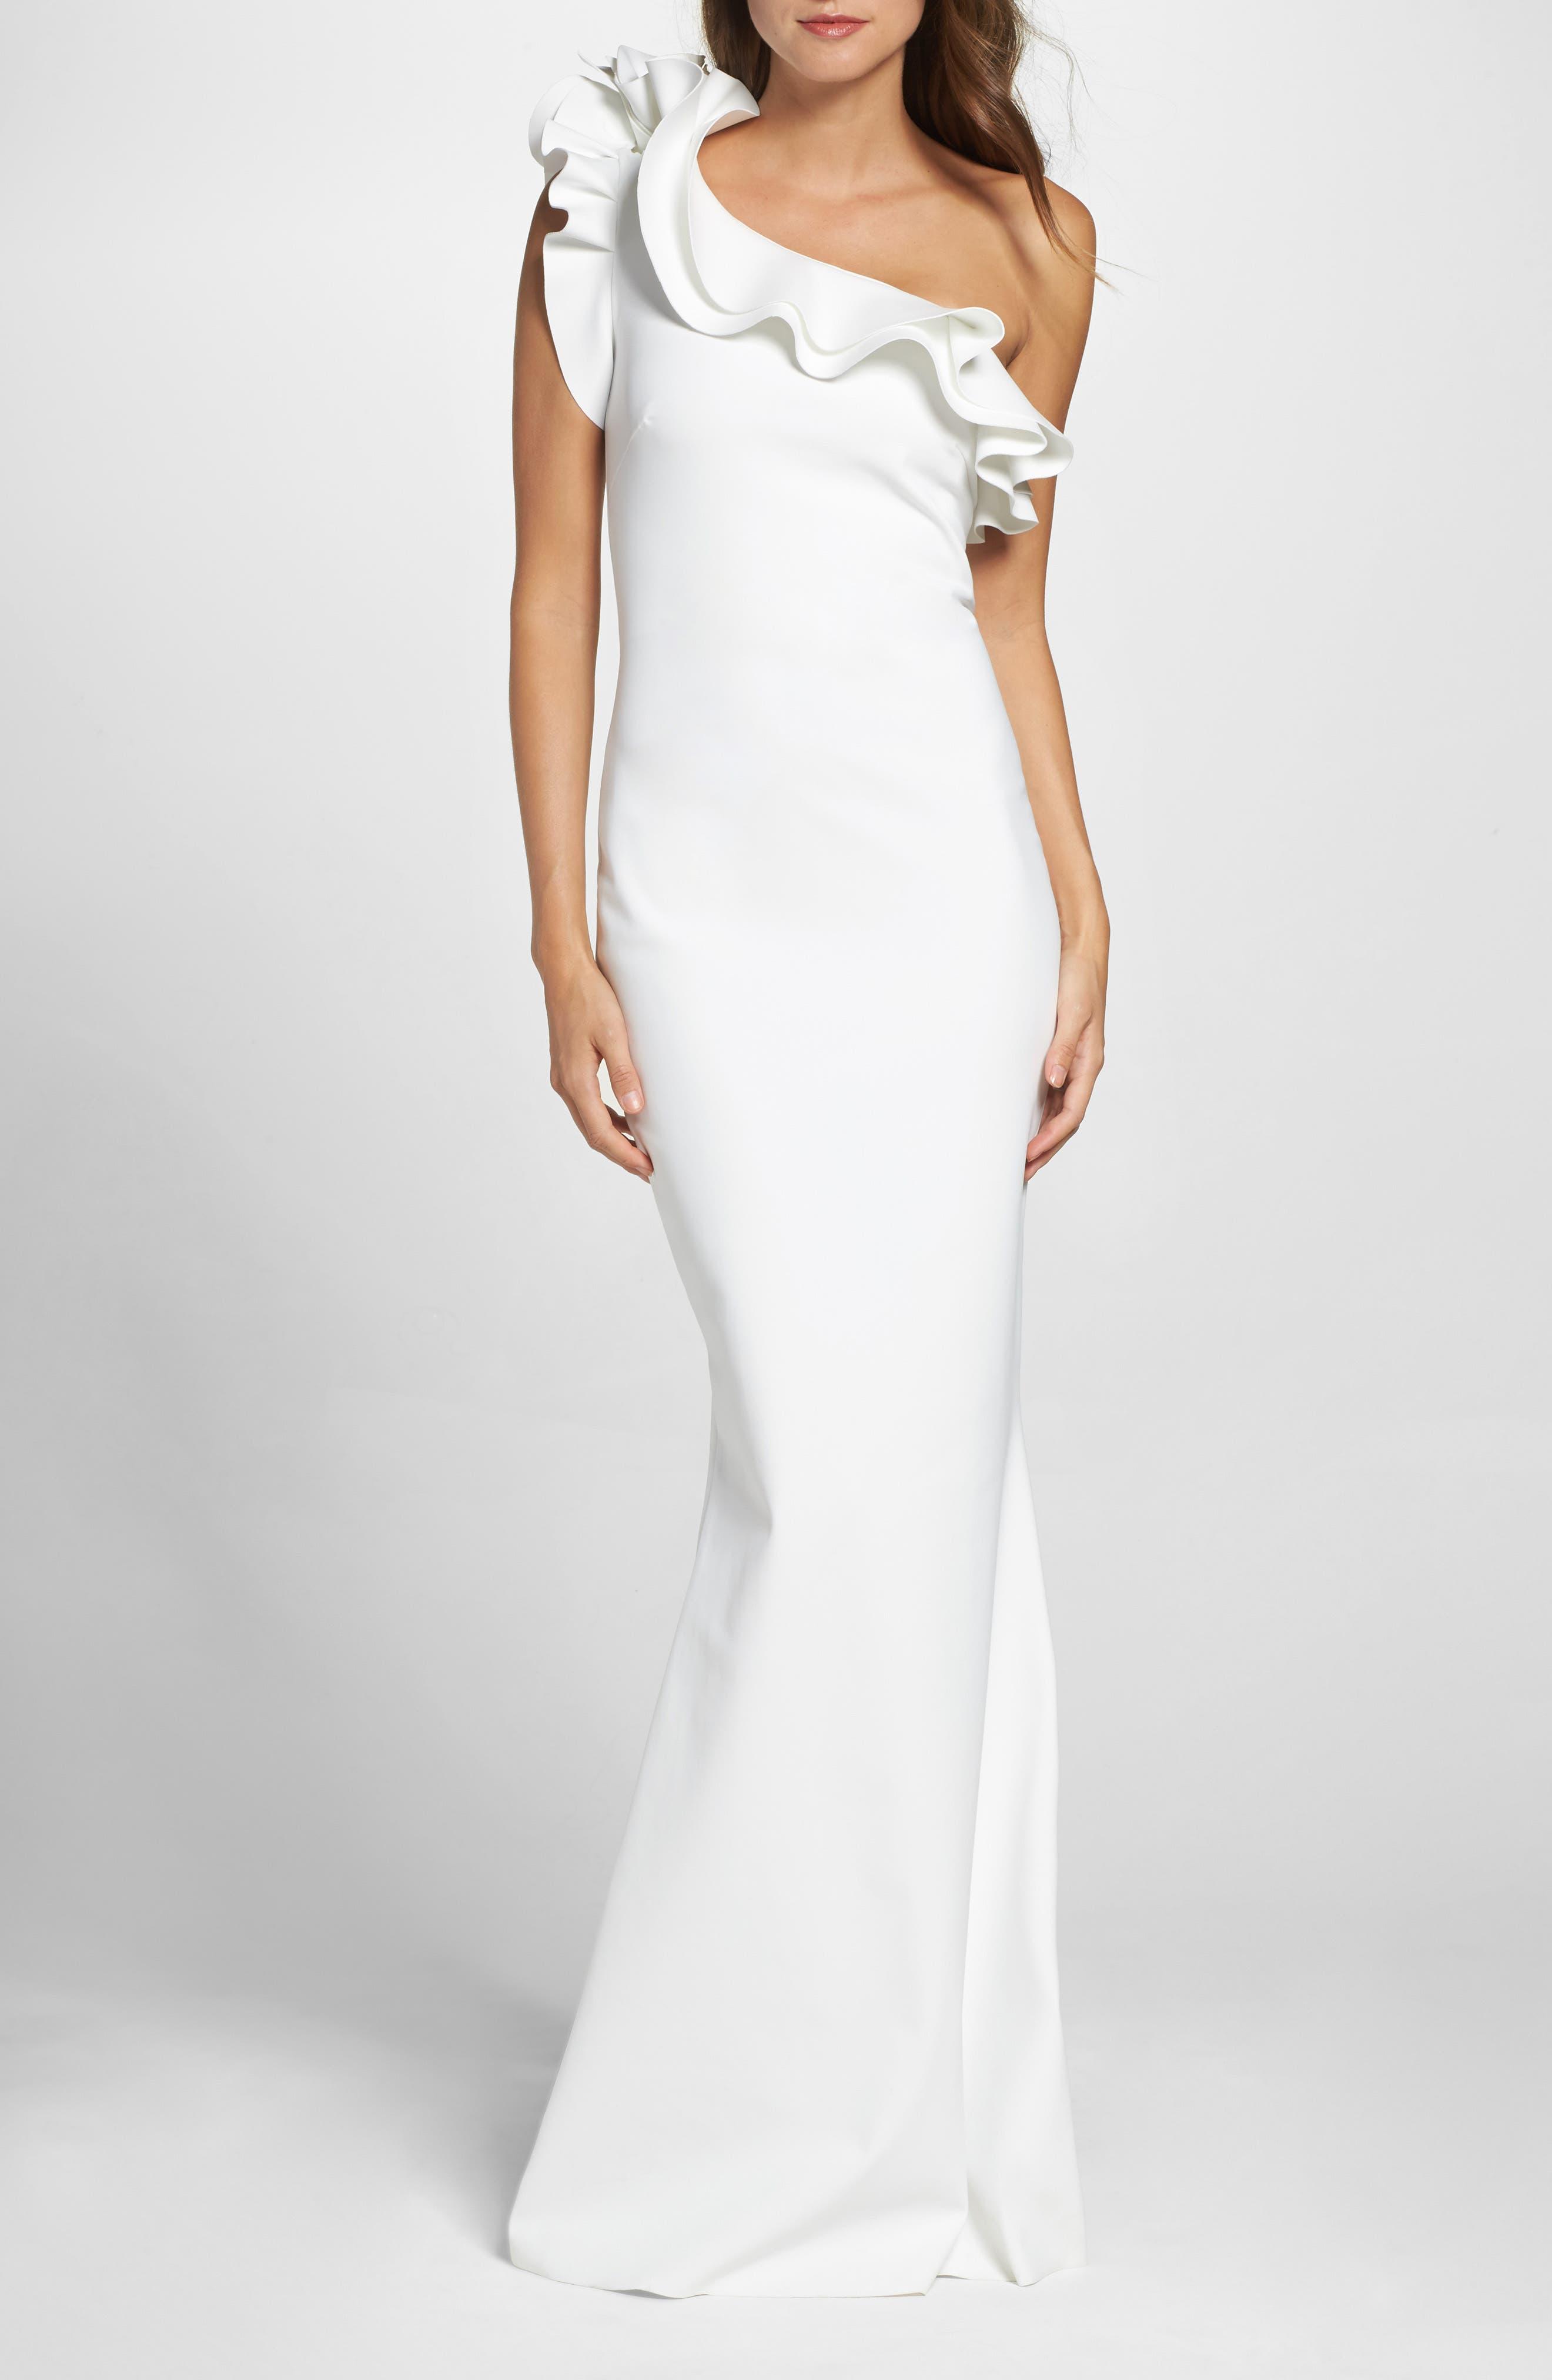 Main Image - Chiara Boni la Petite Robe Elisir Ruffle One-Shoulder Gown